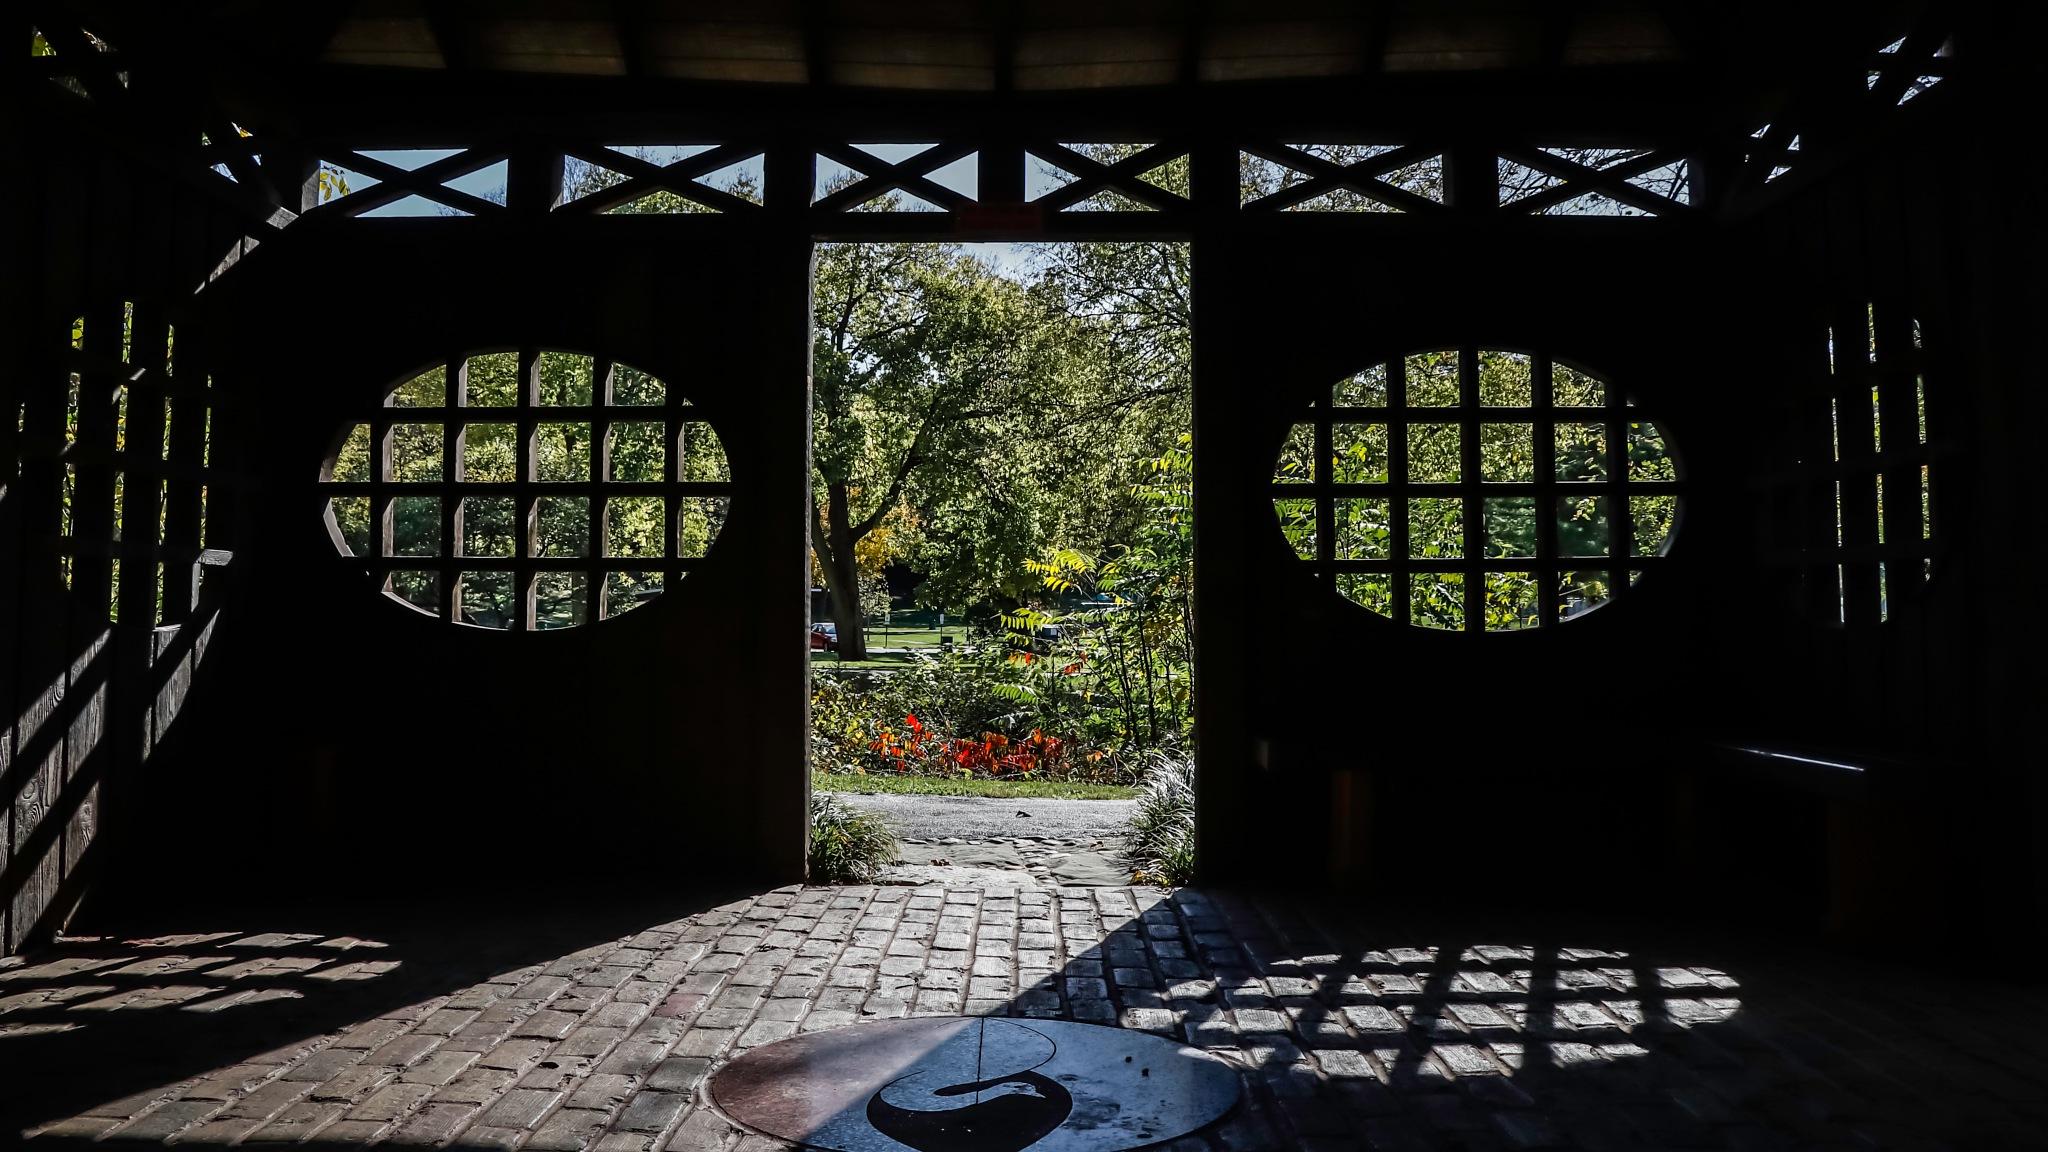 Pagoda Shadows 2 by Mark Hootman